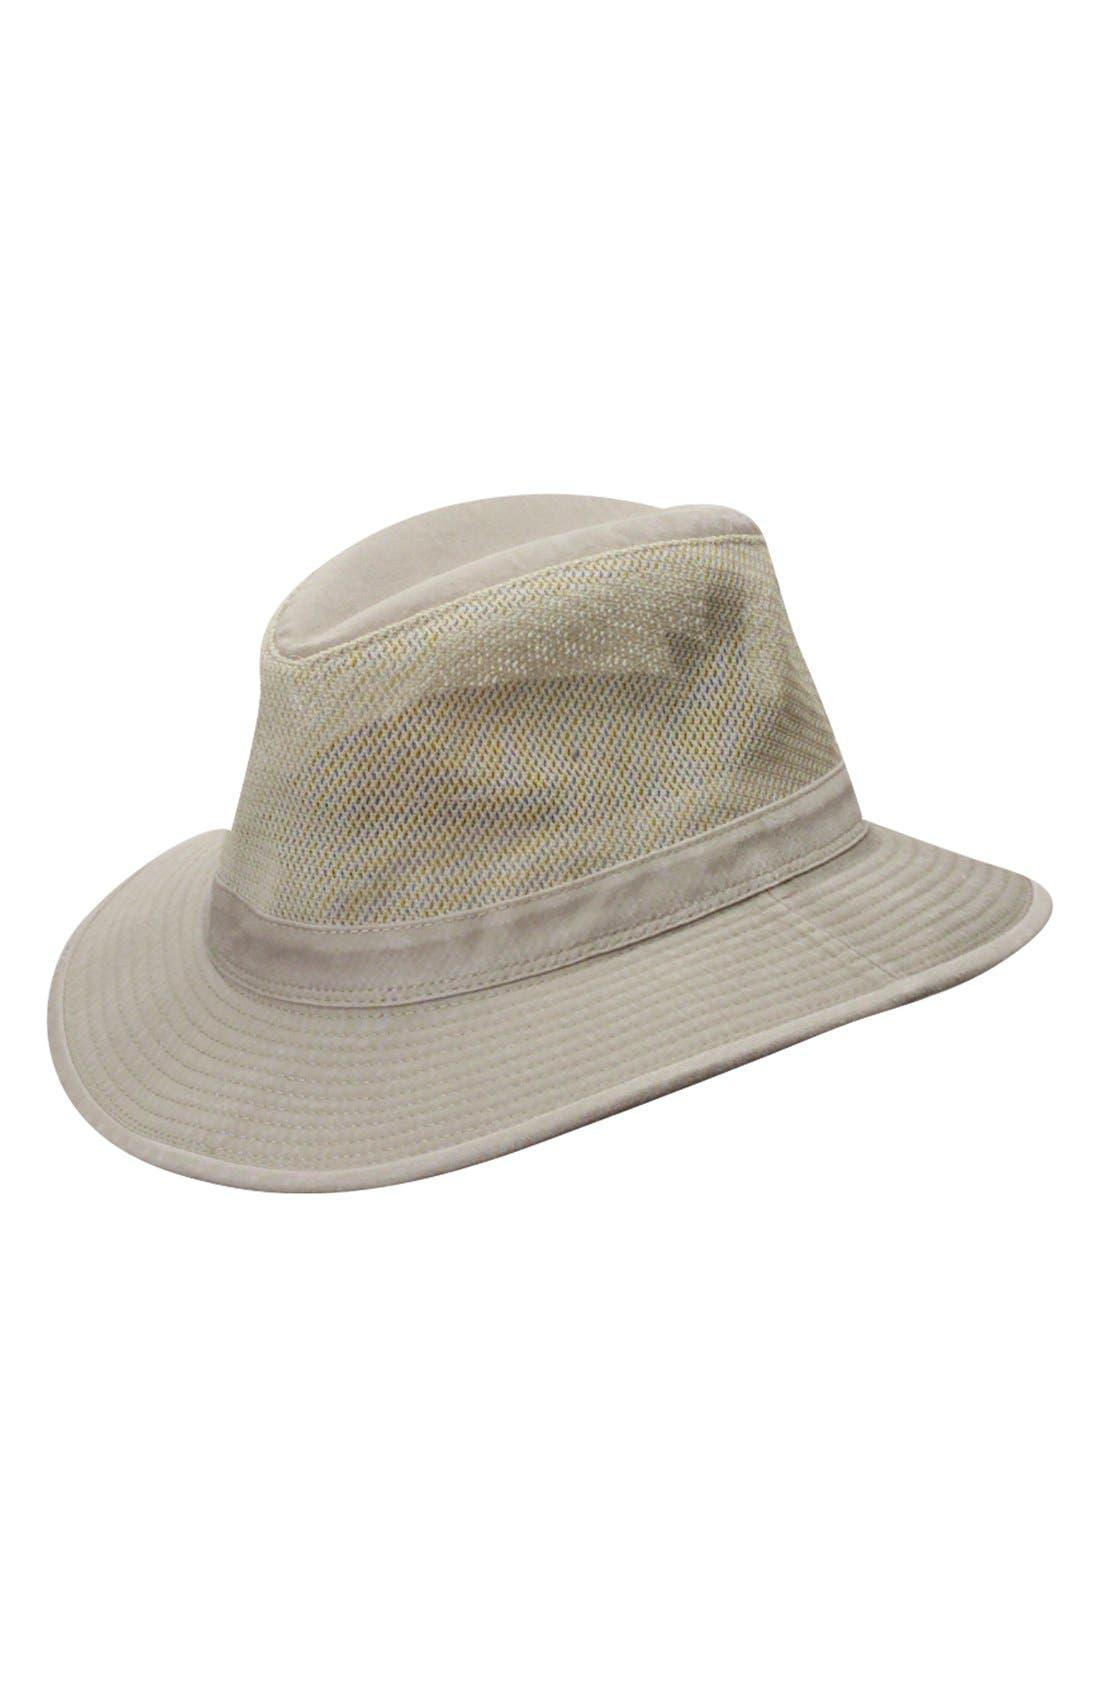 Washed Twill & Mesh Safari Hat,                             Main thumbnail 1, color,                             KHAKI